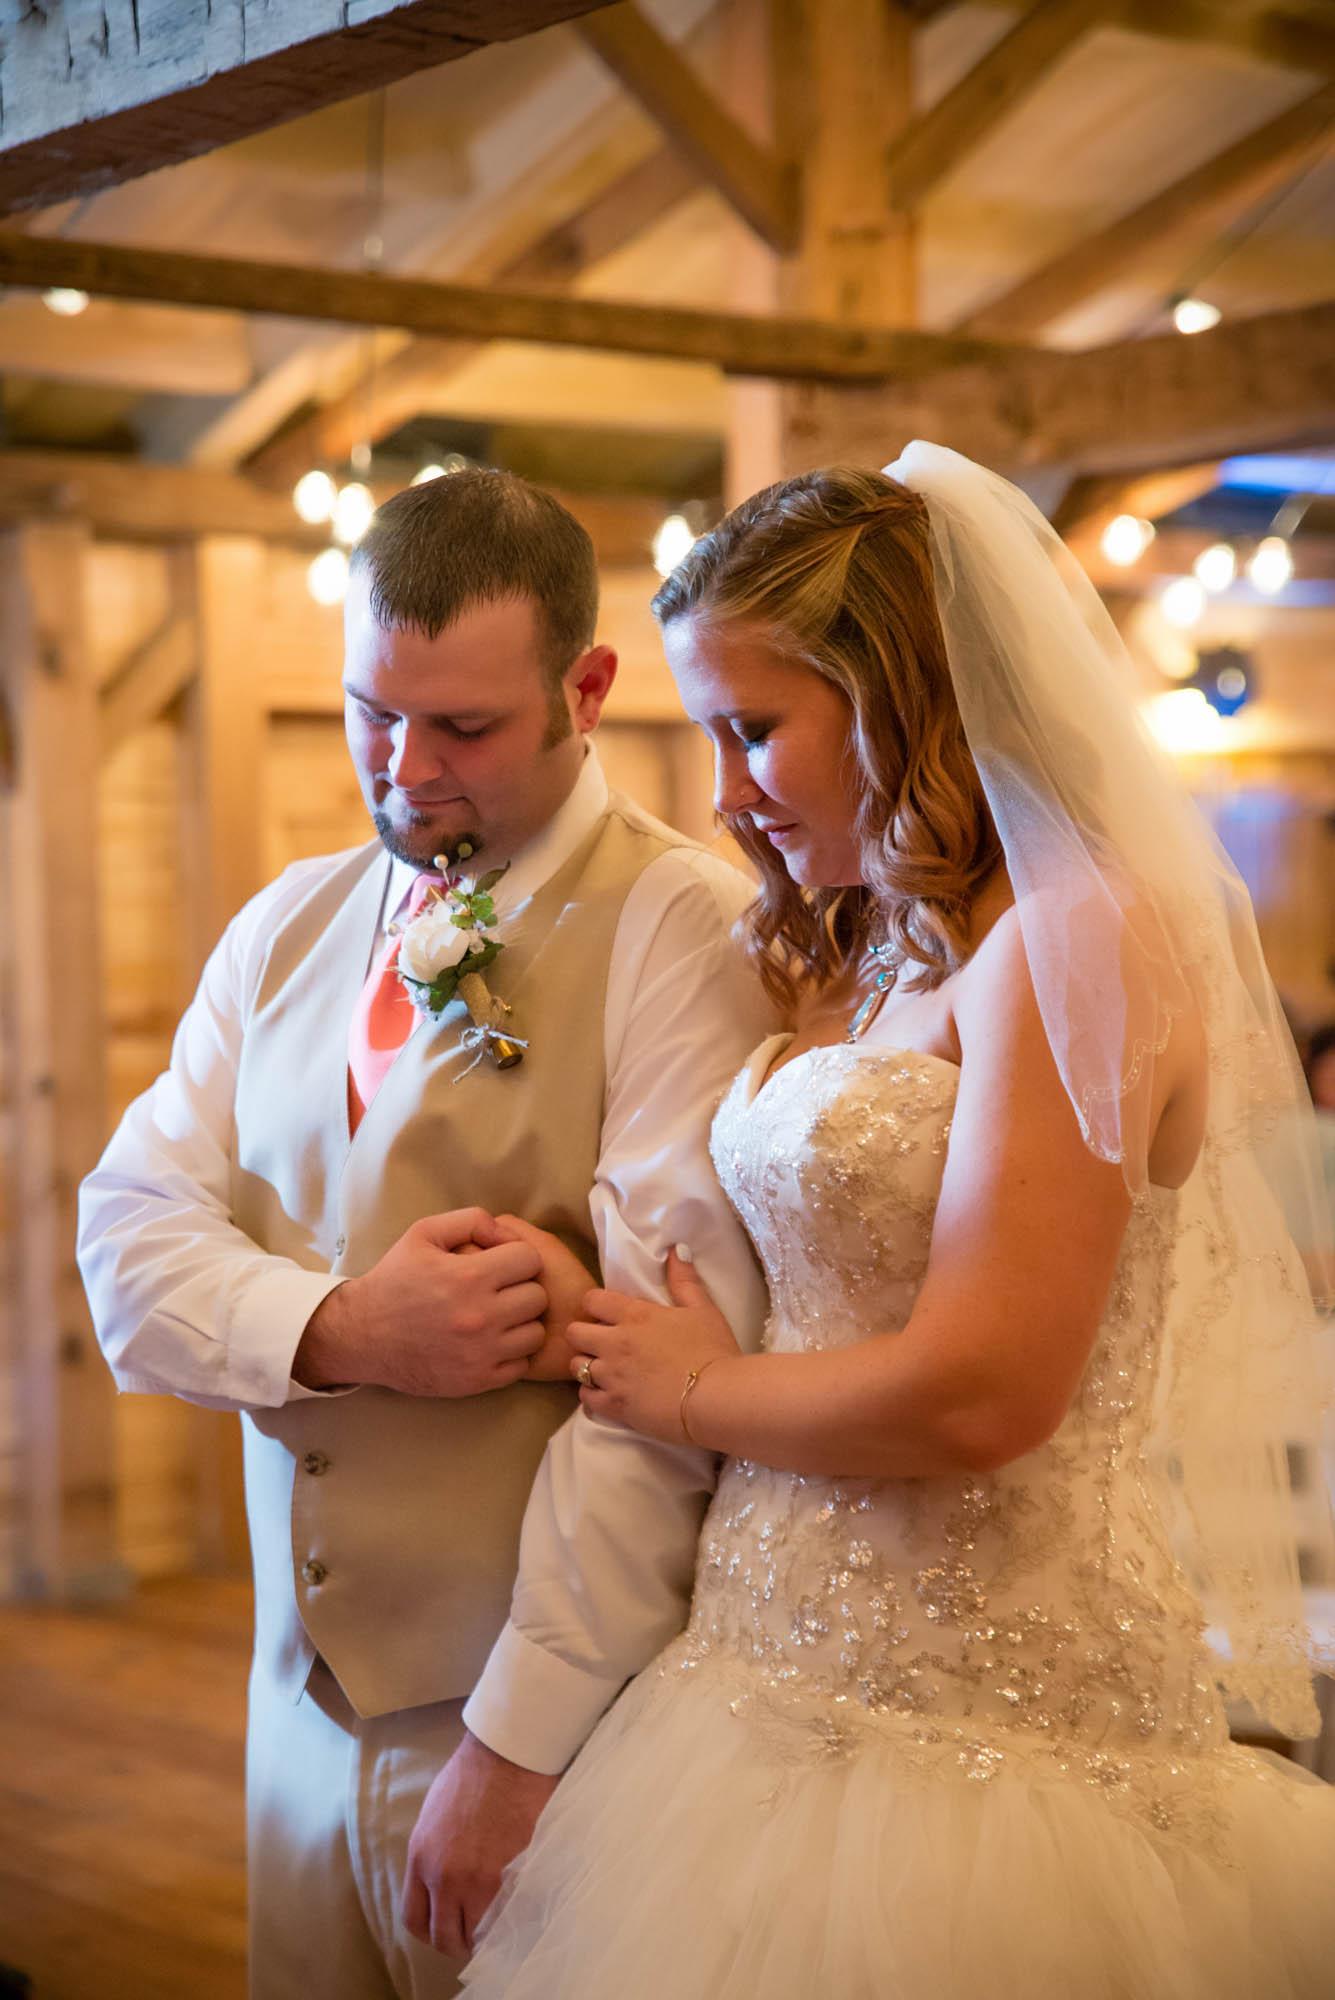 Stephanie Ray Wedding PhotographyDSC_4286w.jpg